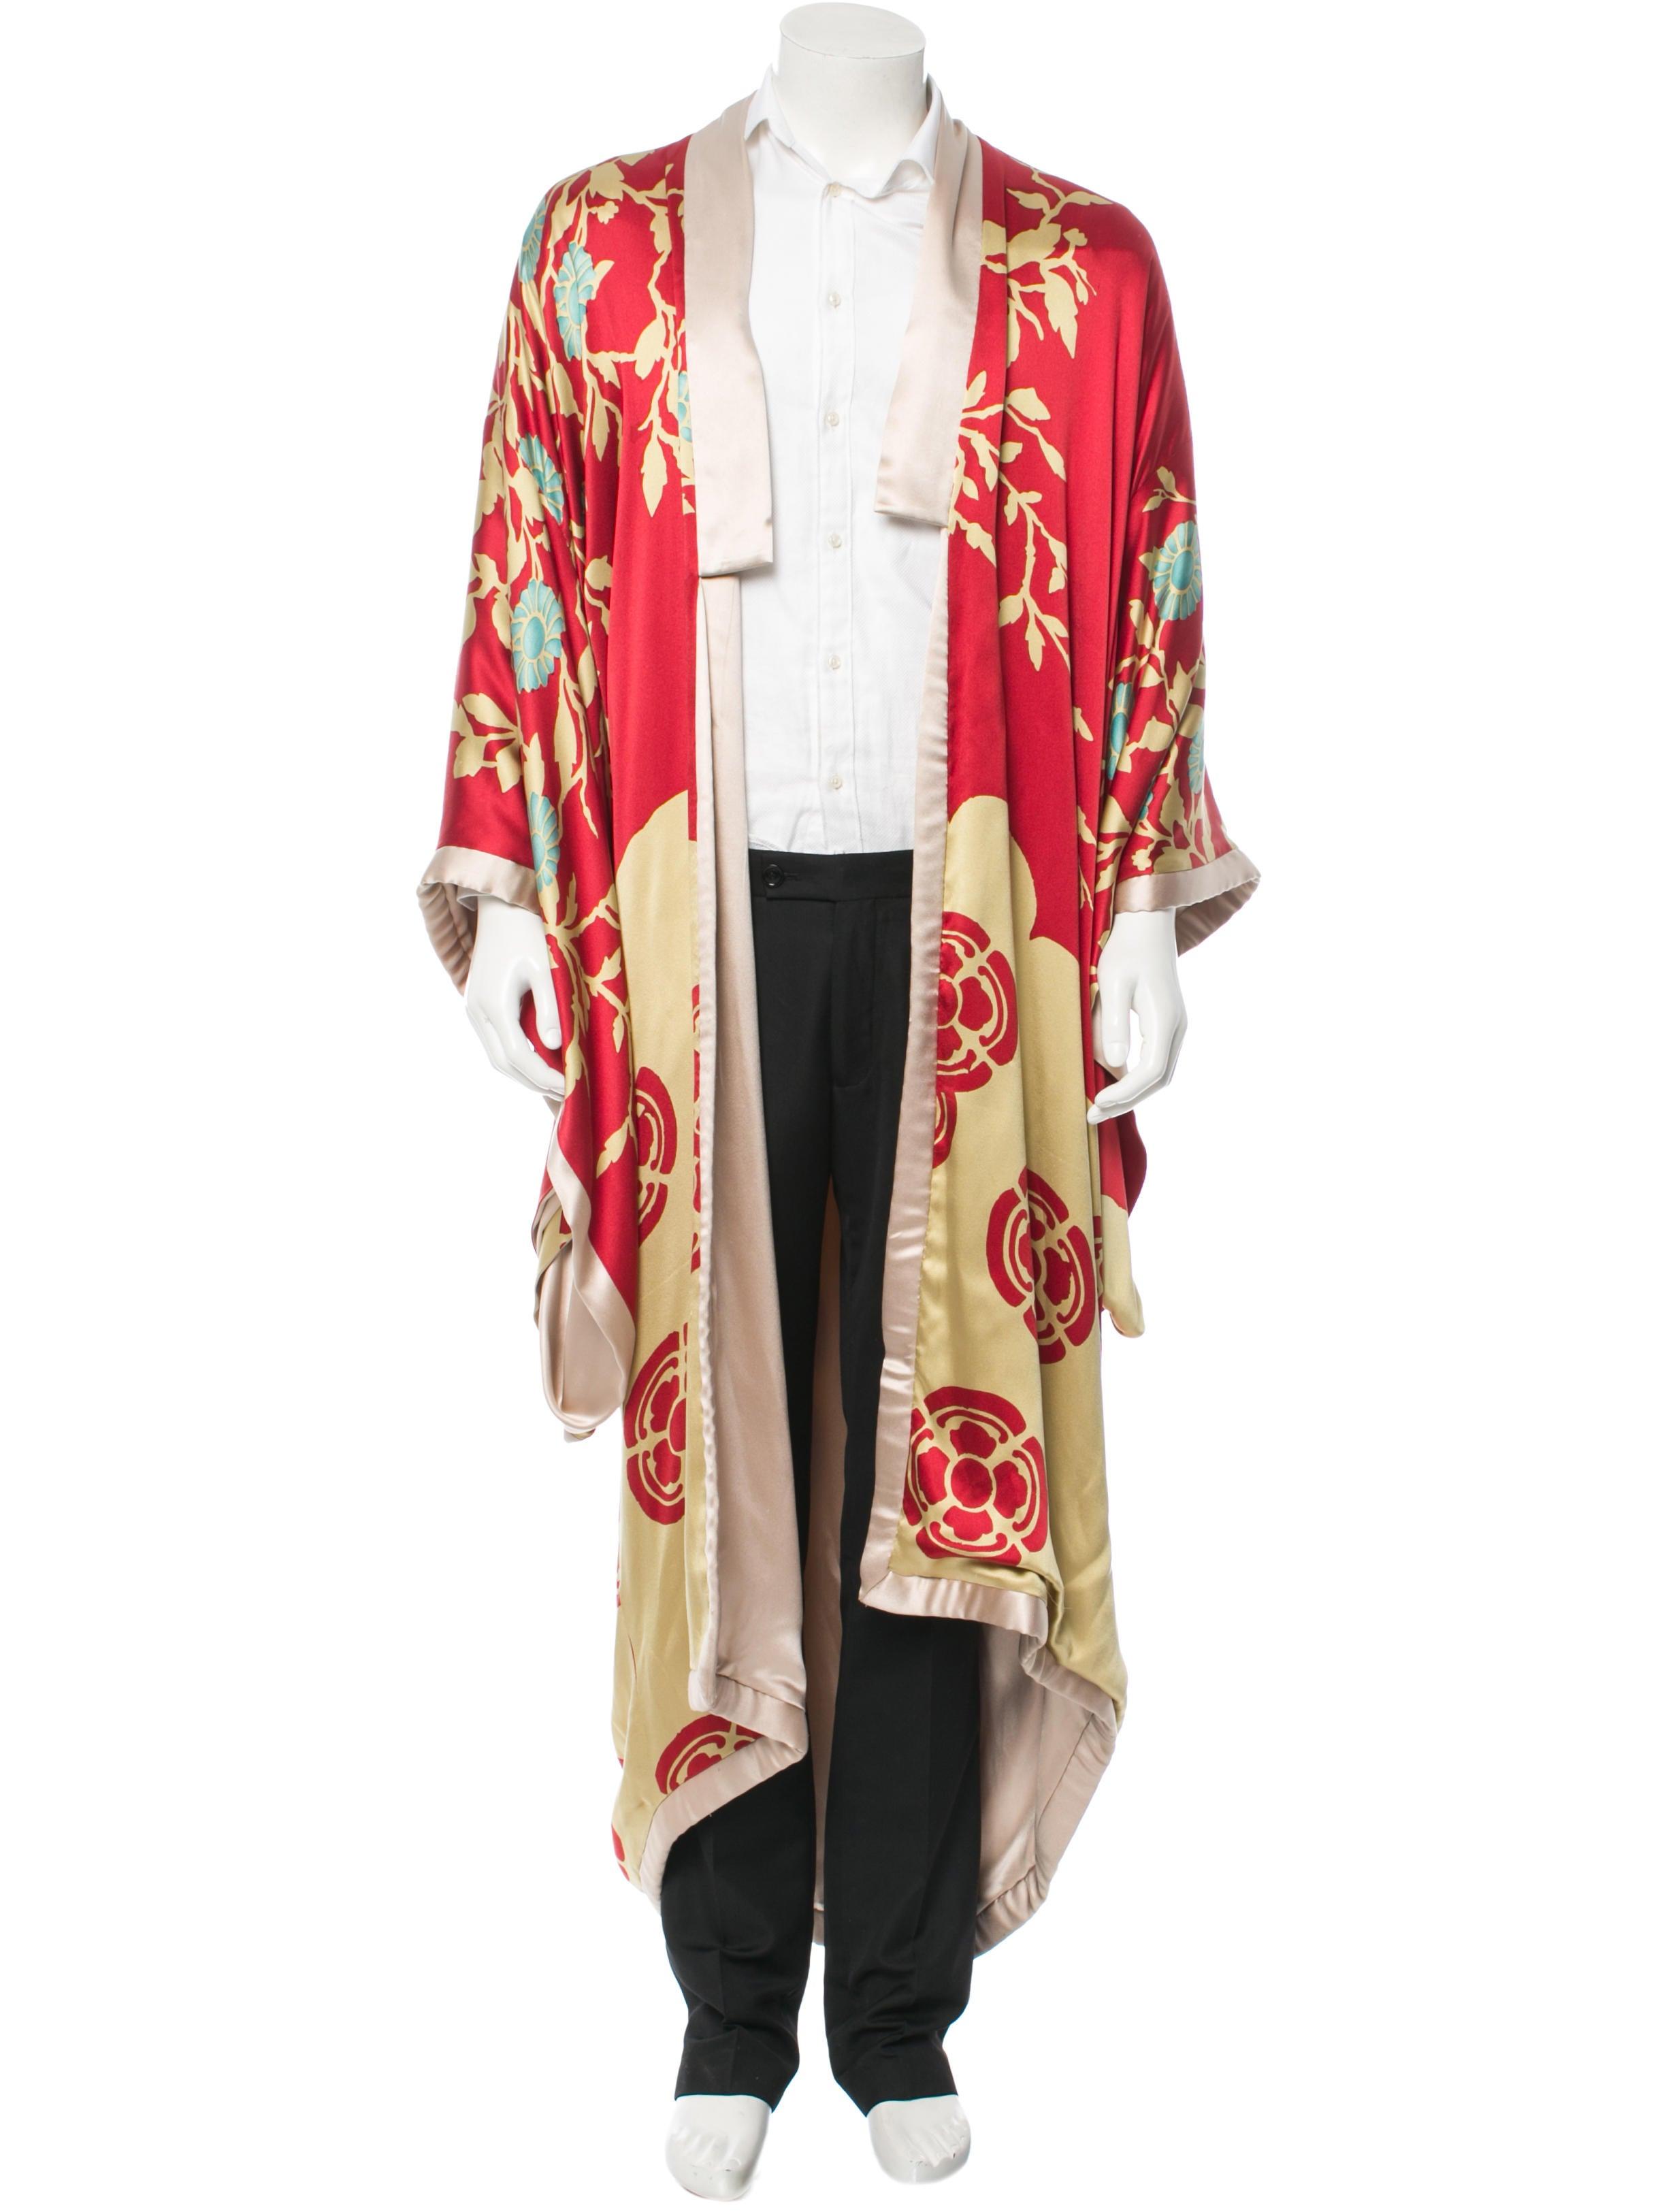 7972ed2730 Gucci Silk Robe - Clothing - GUC63041